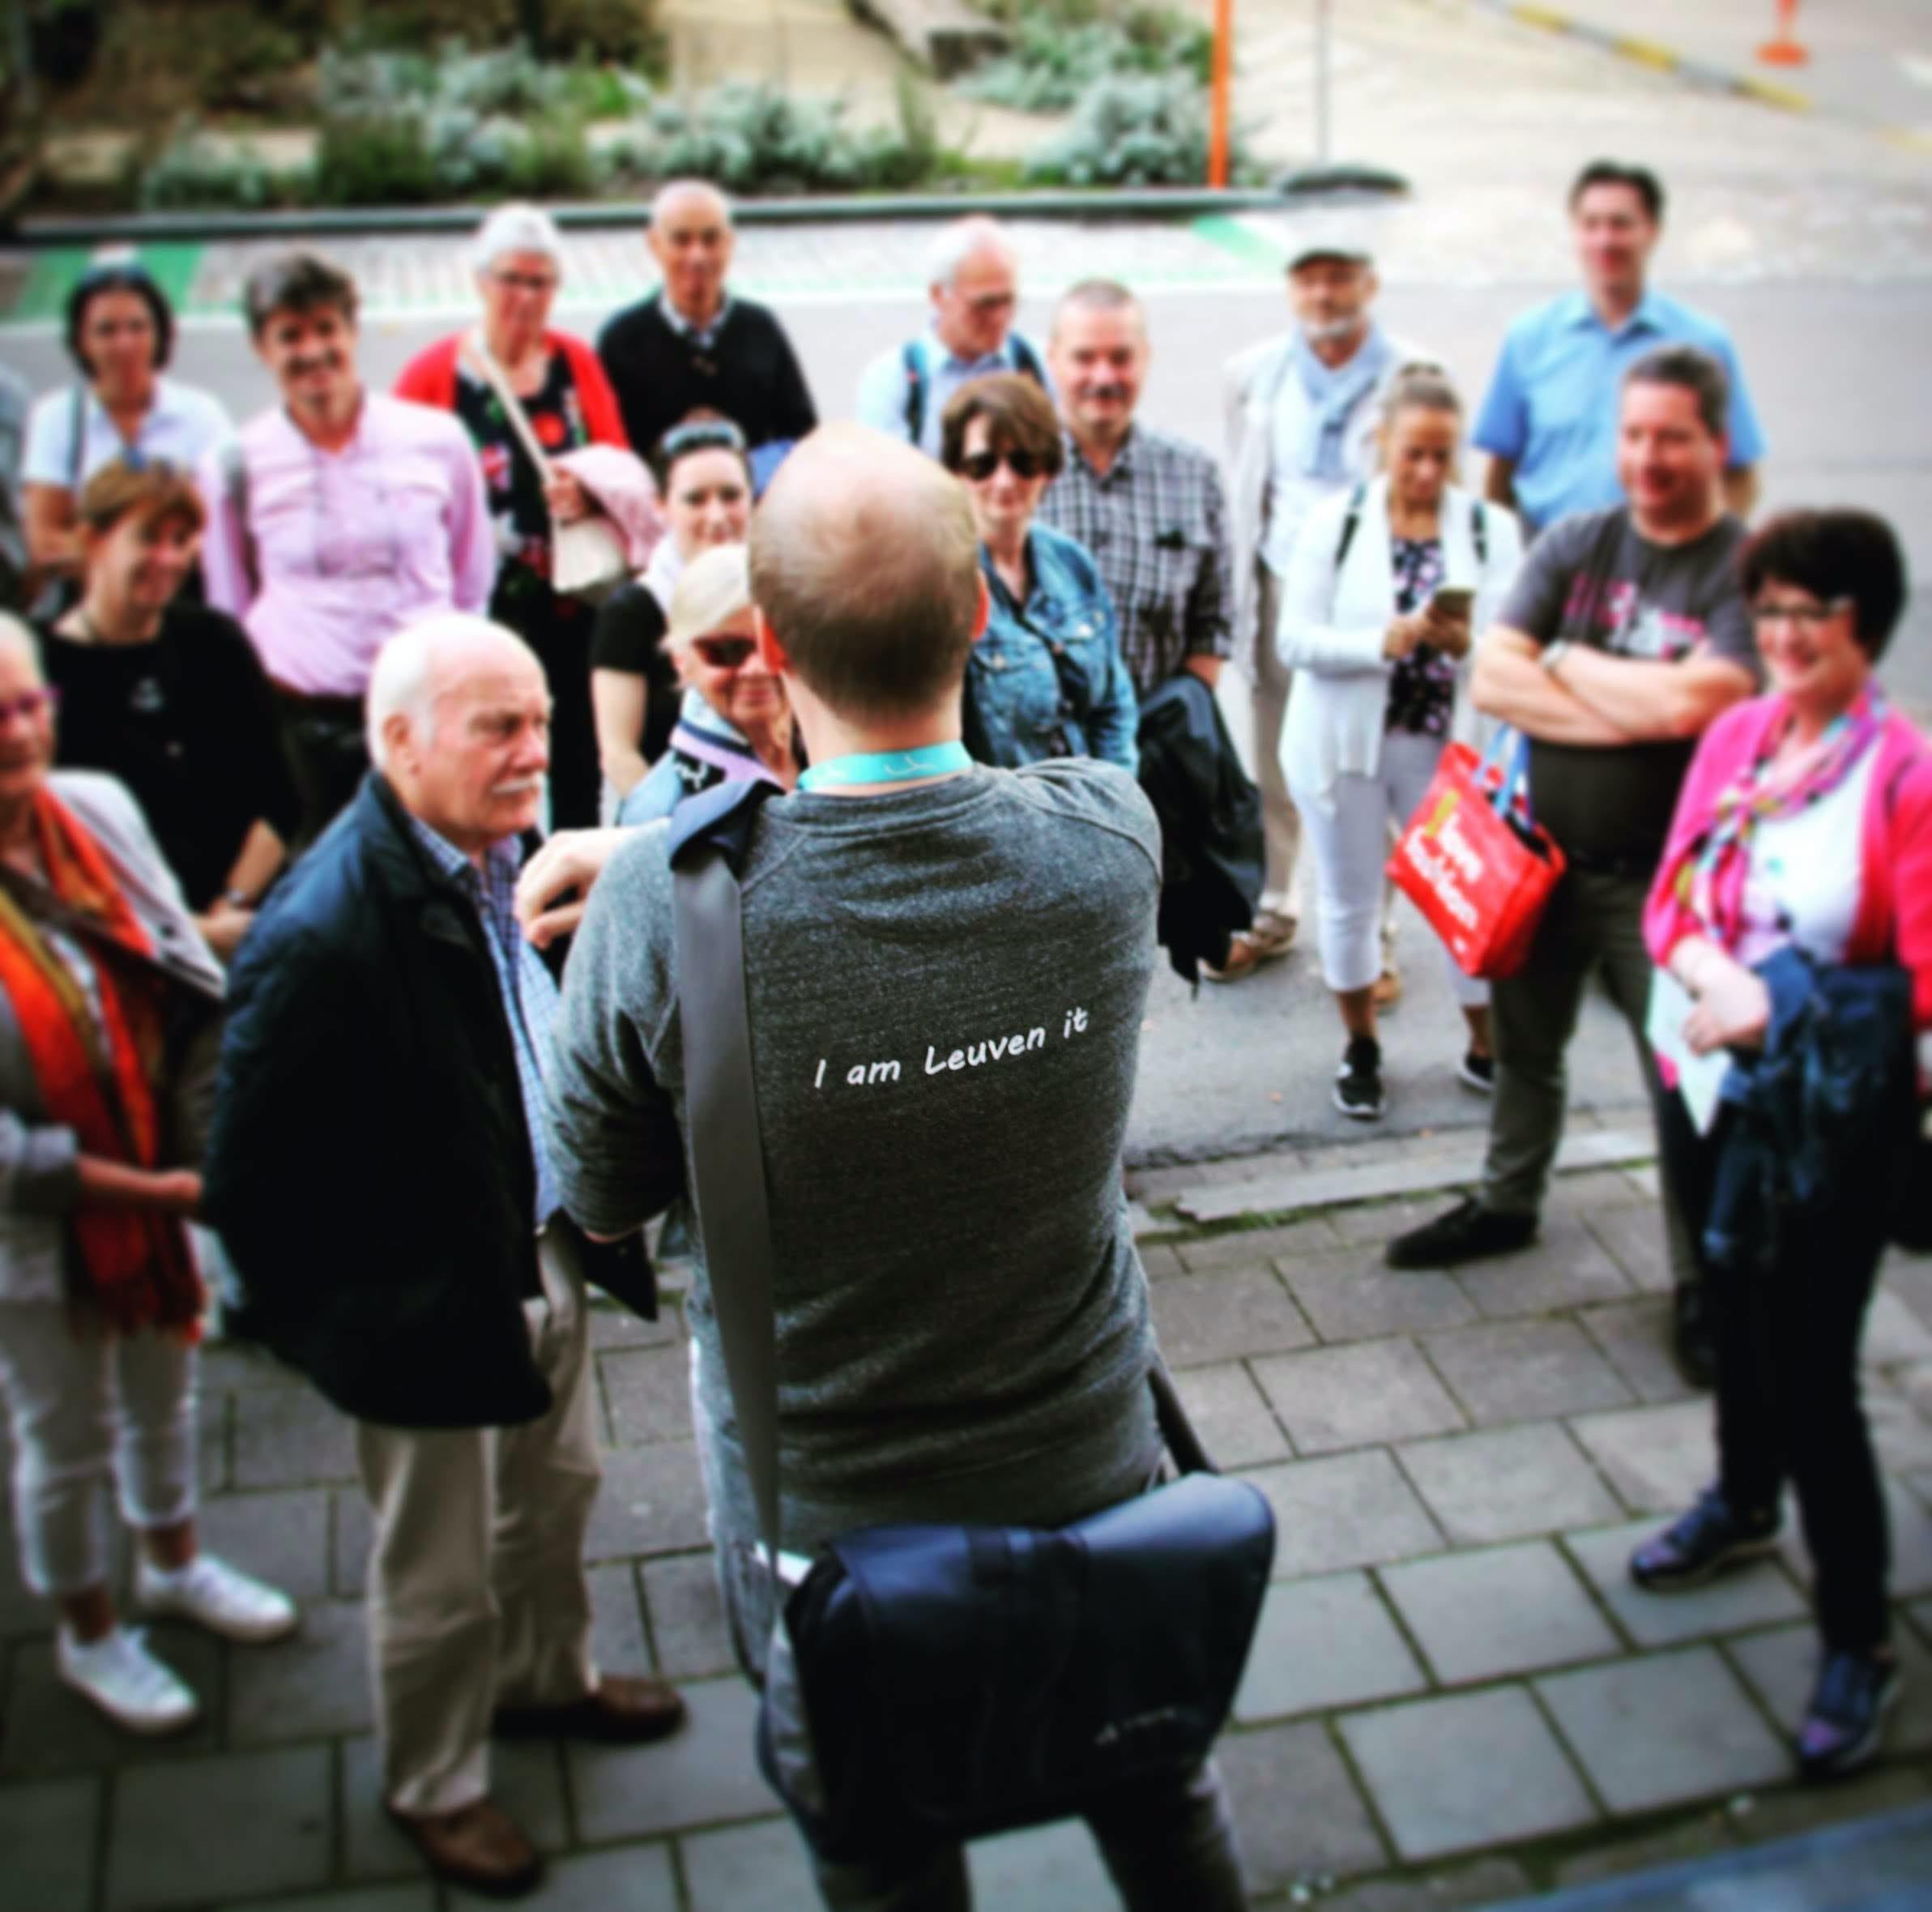 Tour privado pelos destaques e recantos escondidos de Leuven